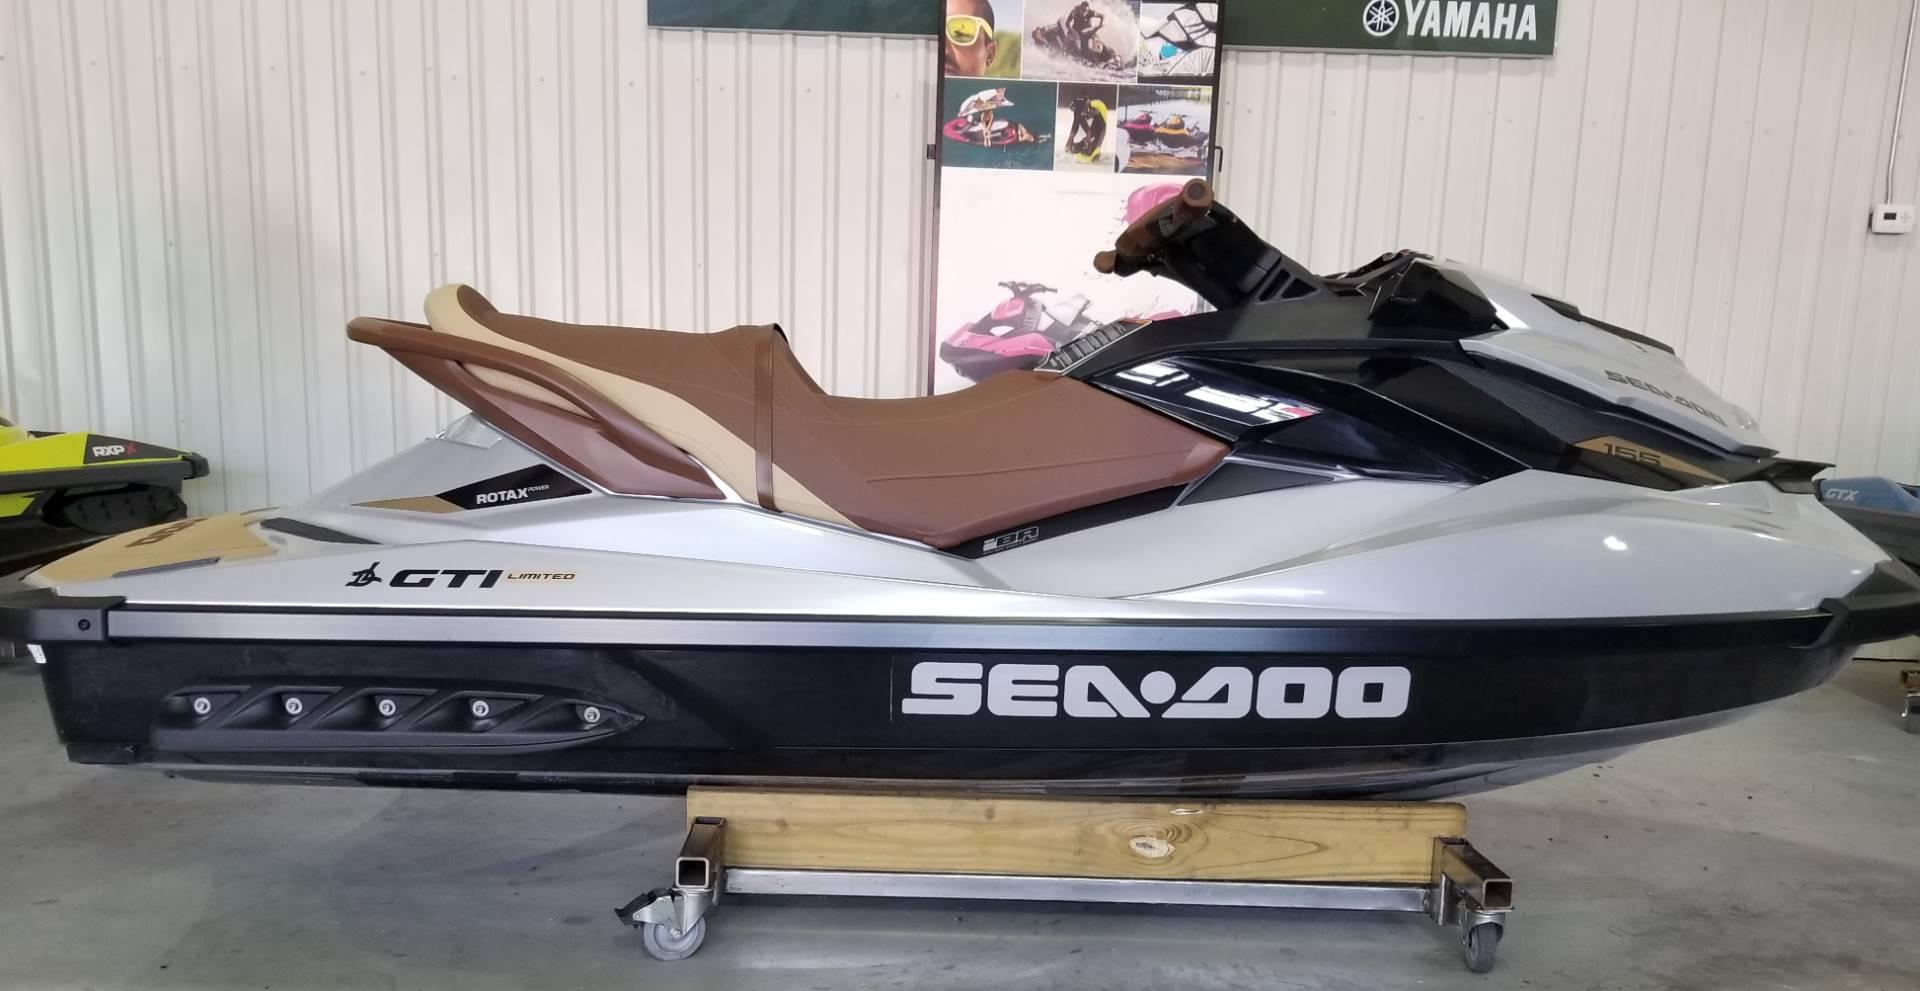 2018 Sea-Doo GTI Limited 155 1